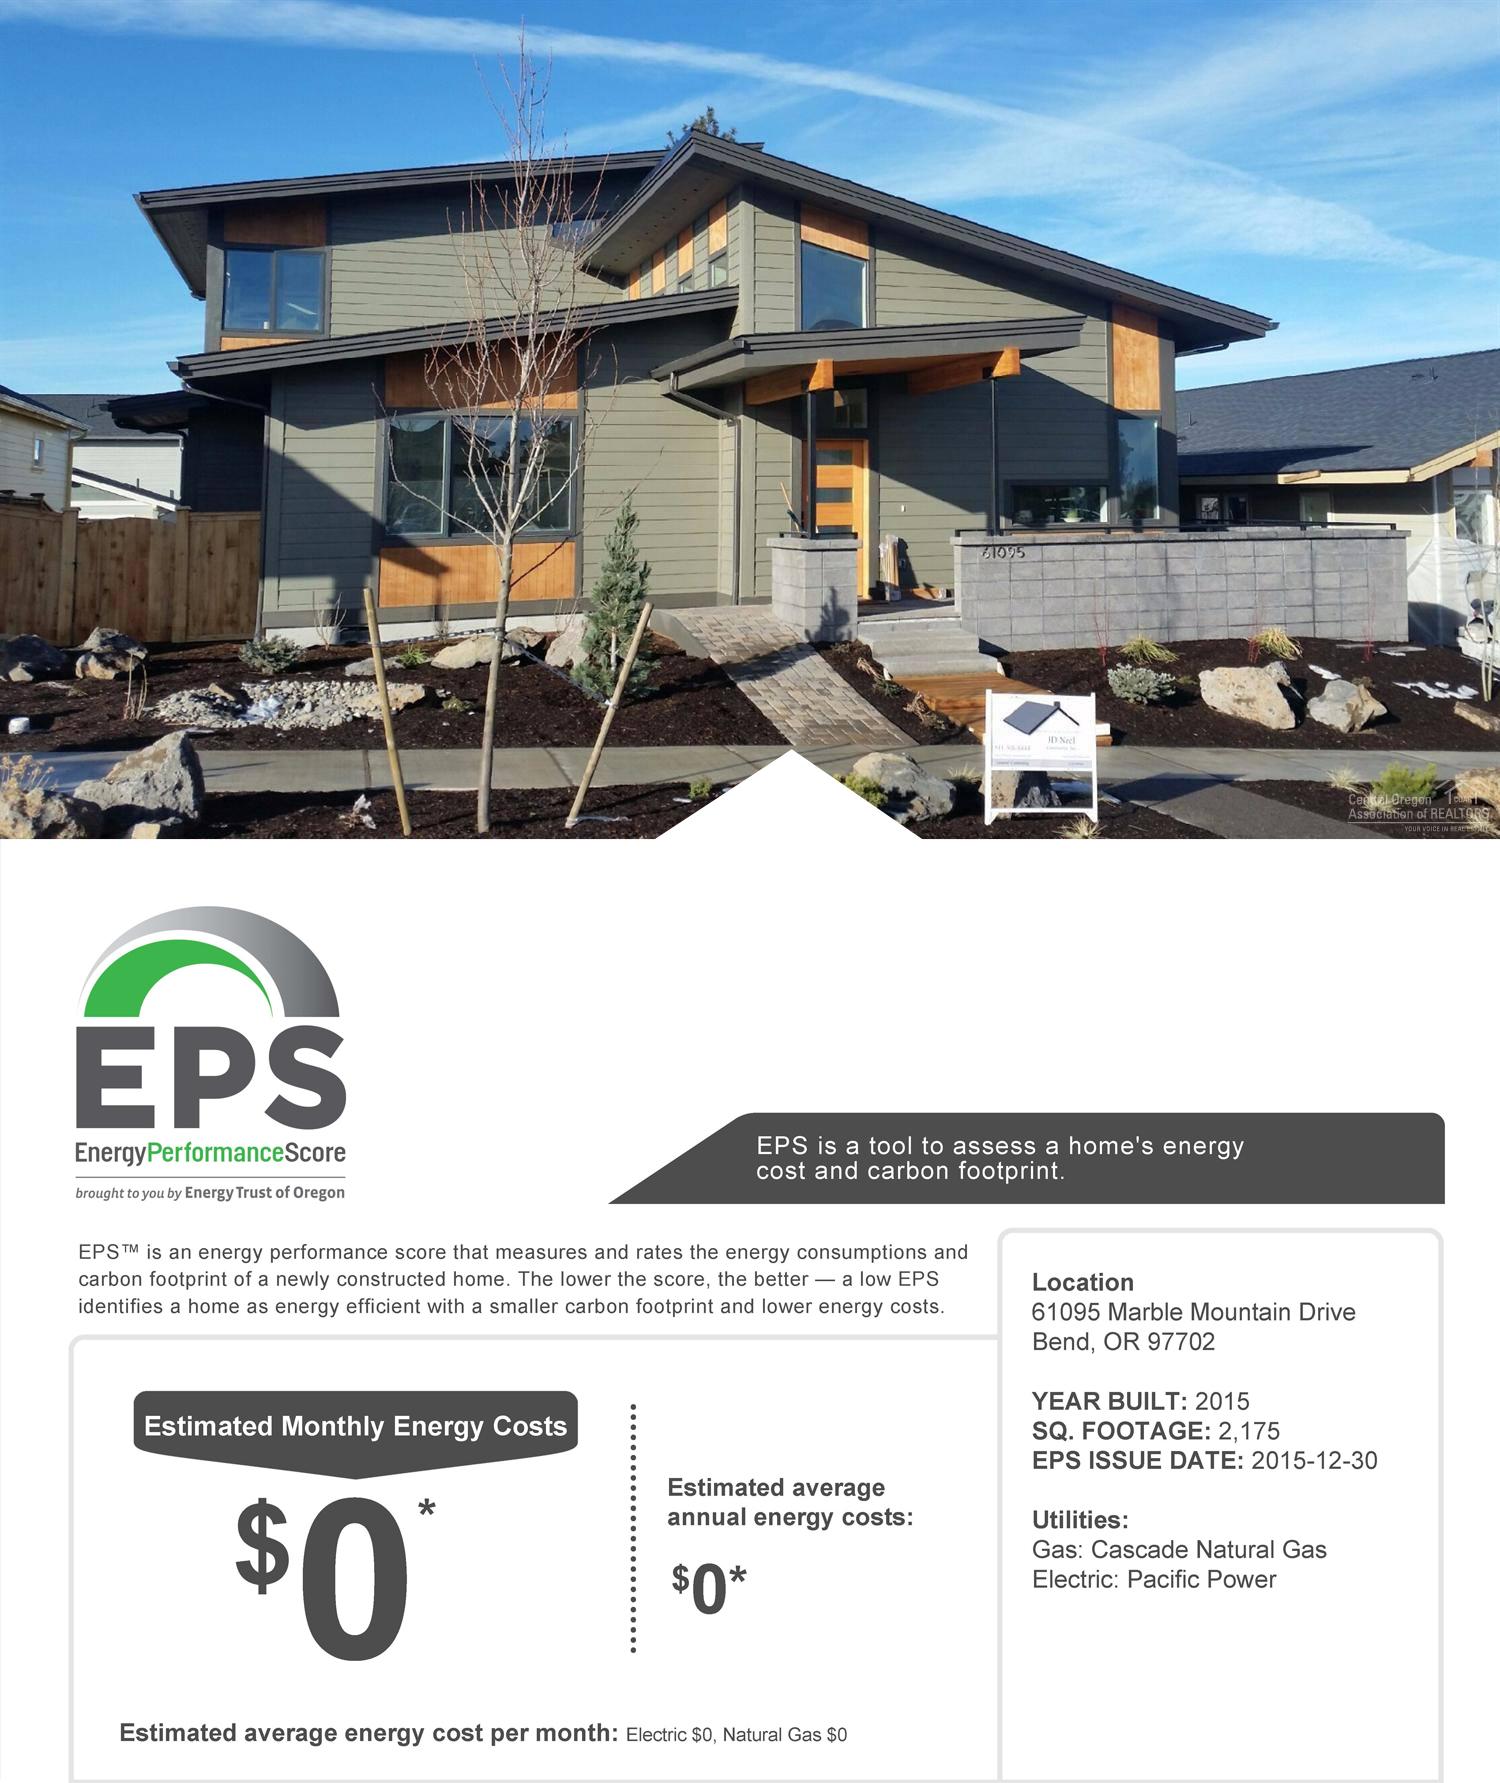 Best Kitchen Gallery: Green Home Builders Jd Neel Construction Inc Bend Oregon of Cheap Energy Efficient Home Construction on rachelxblog.com